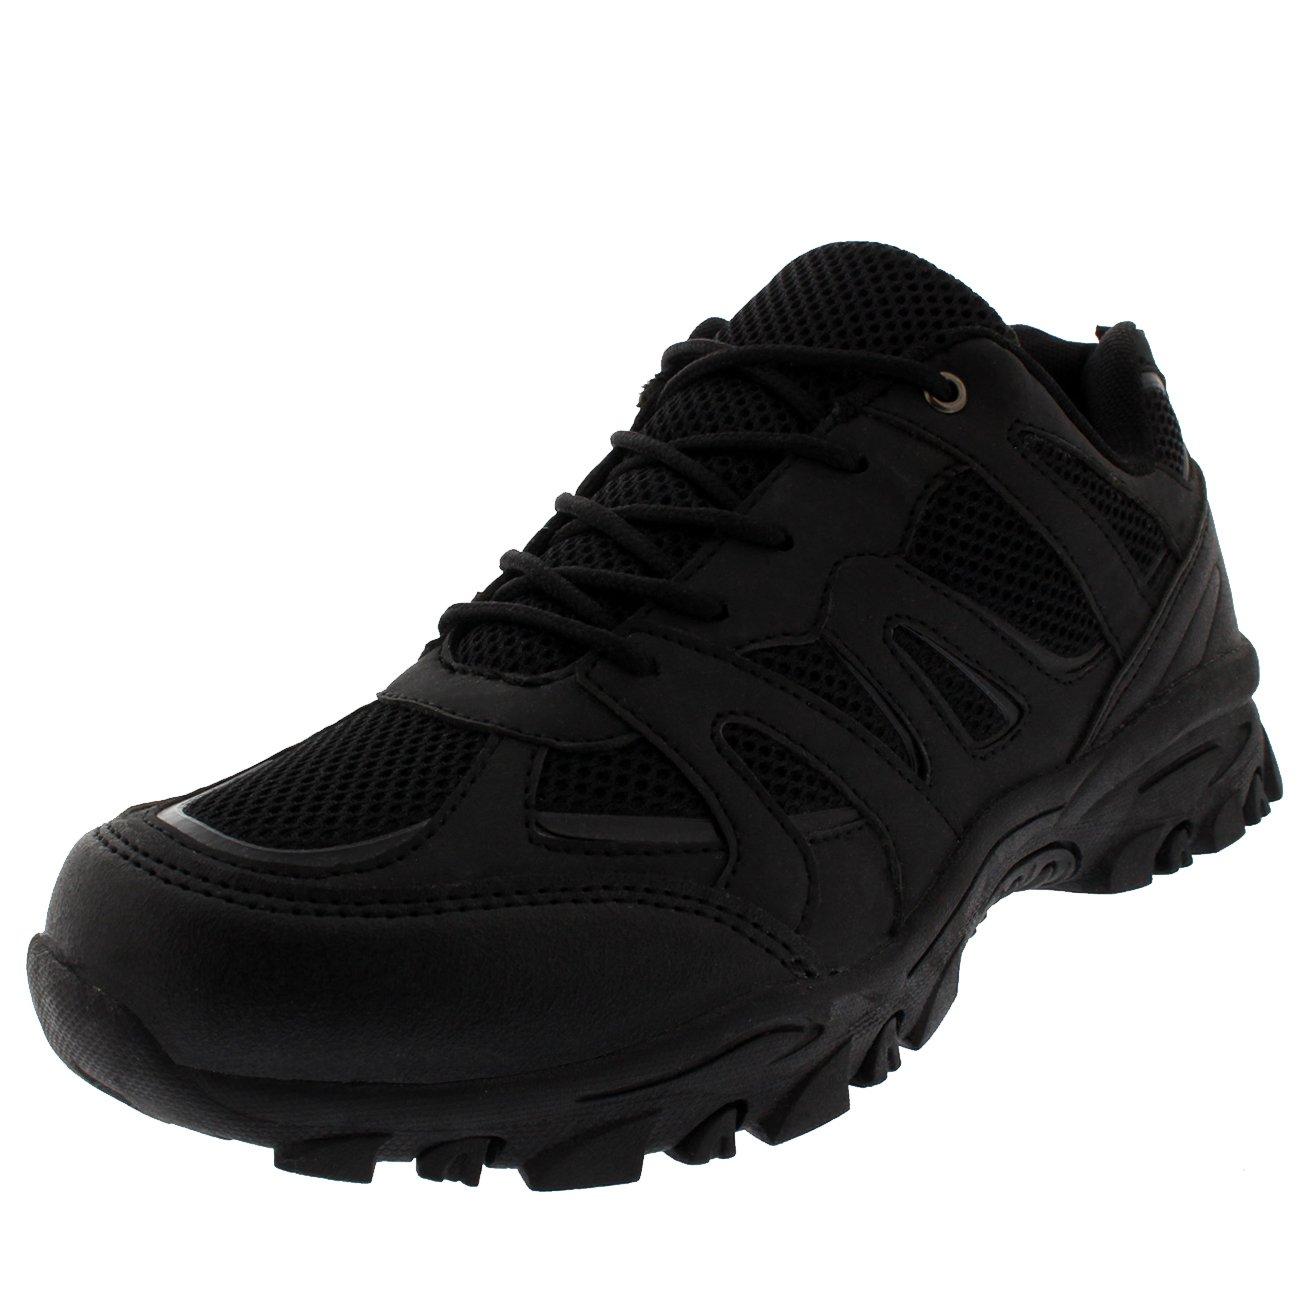 Get Fit Mens Hiking Boot Walking Lightweight Fitness Shock Absorbing Sneakers - Black - US11/EU44 - BS0174